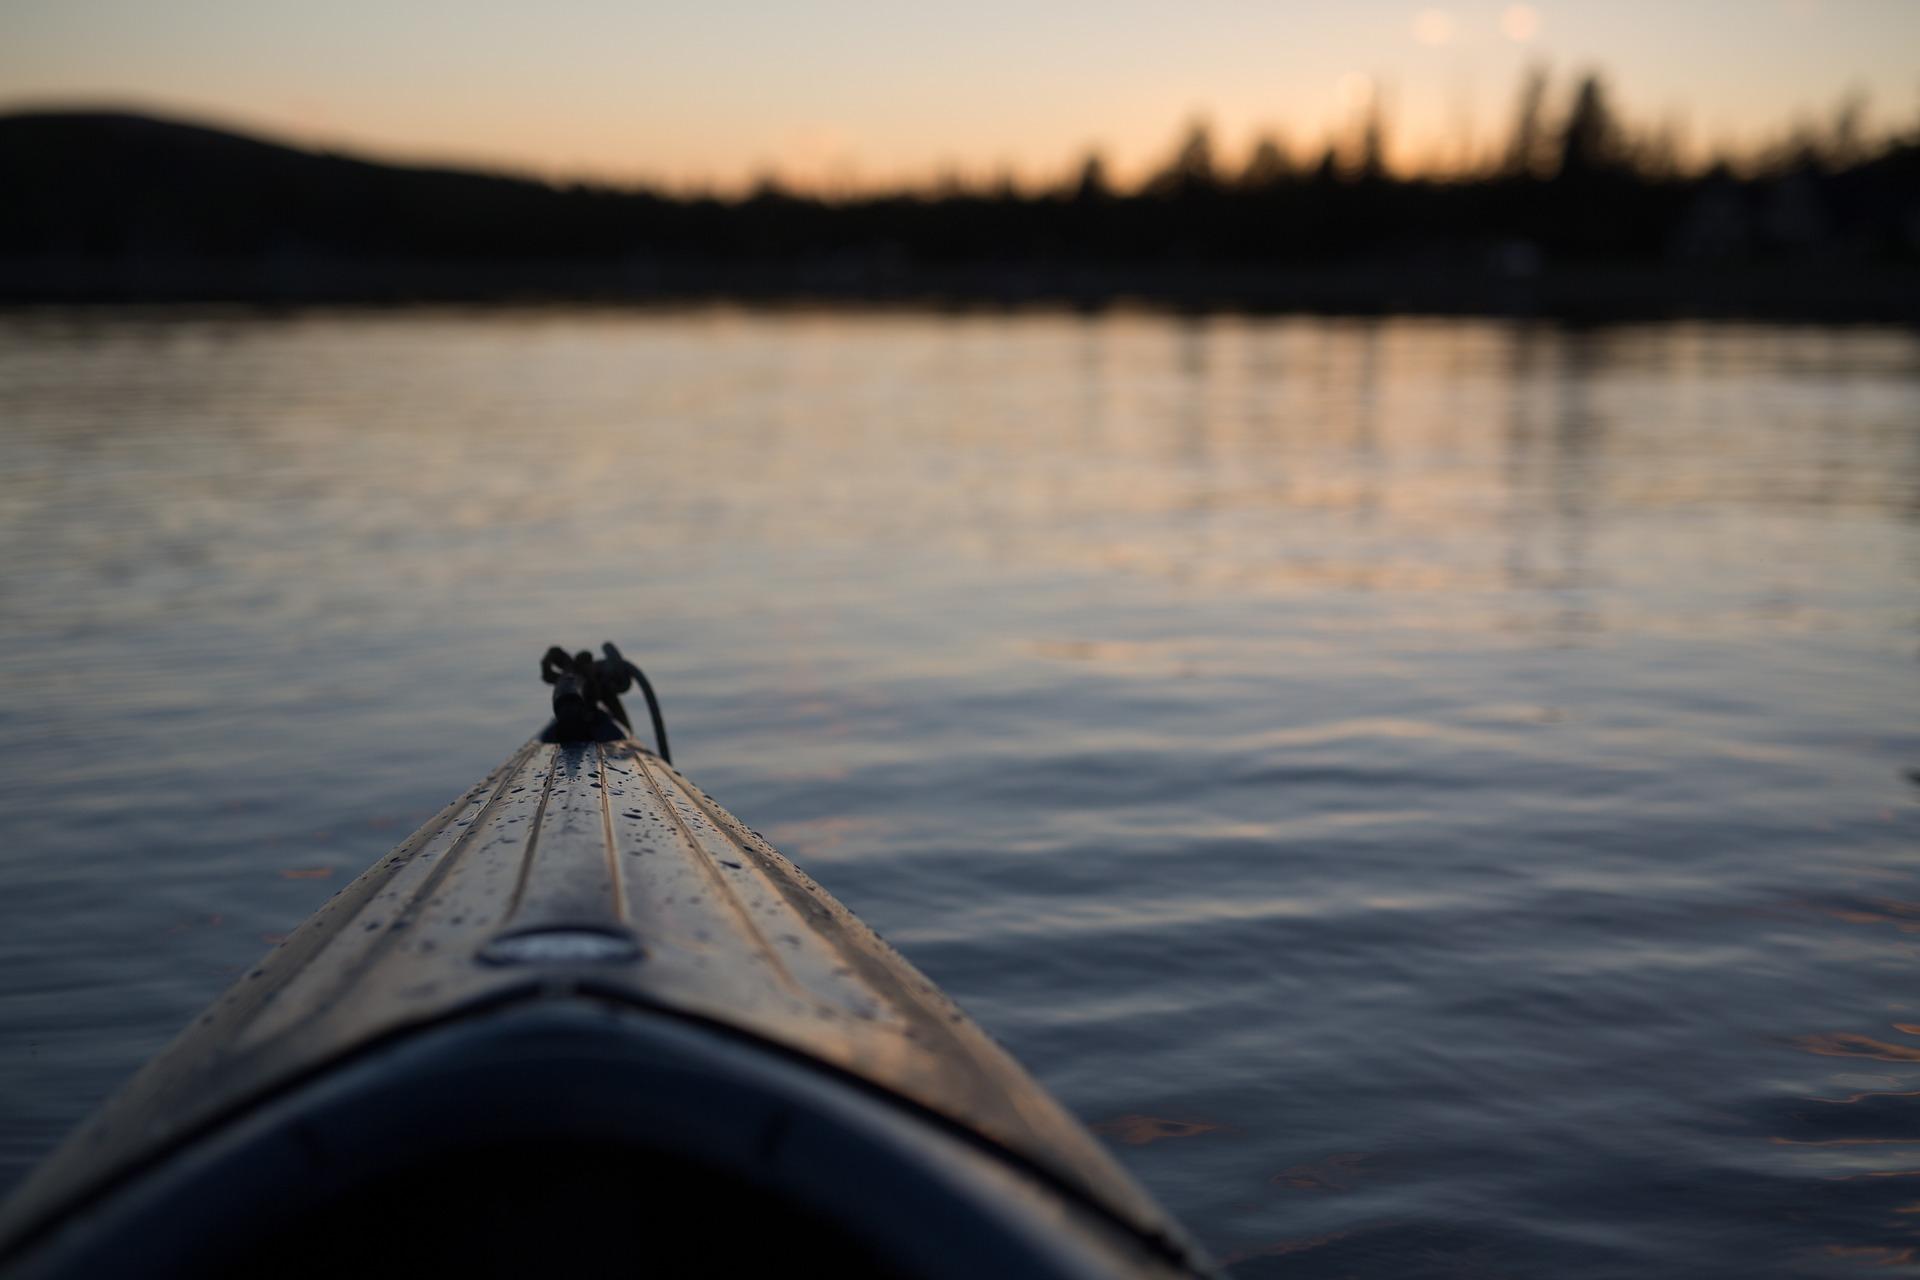 canoe-1149501_1920.jpg